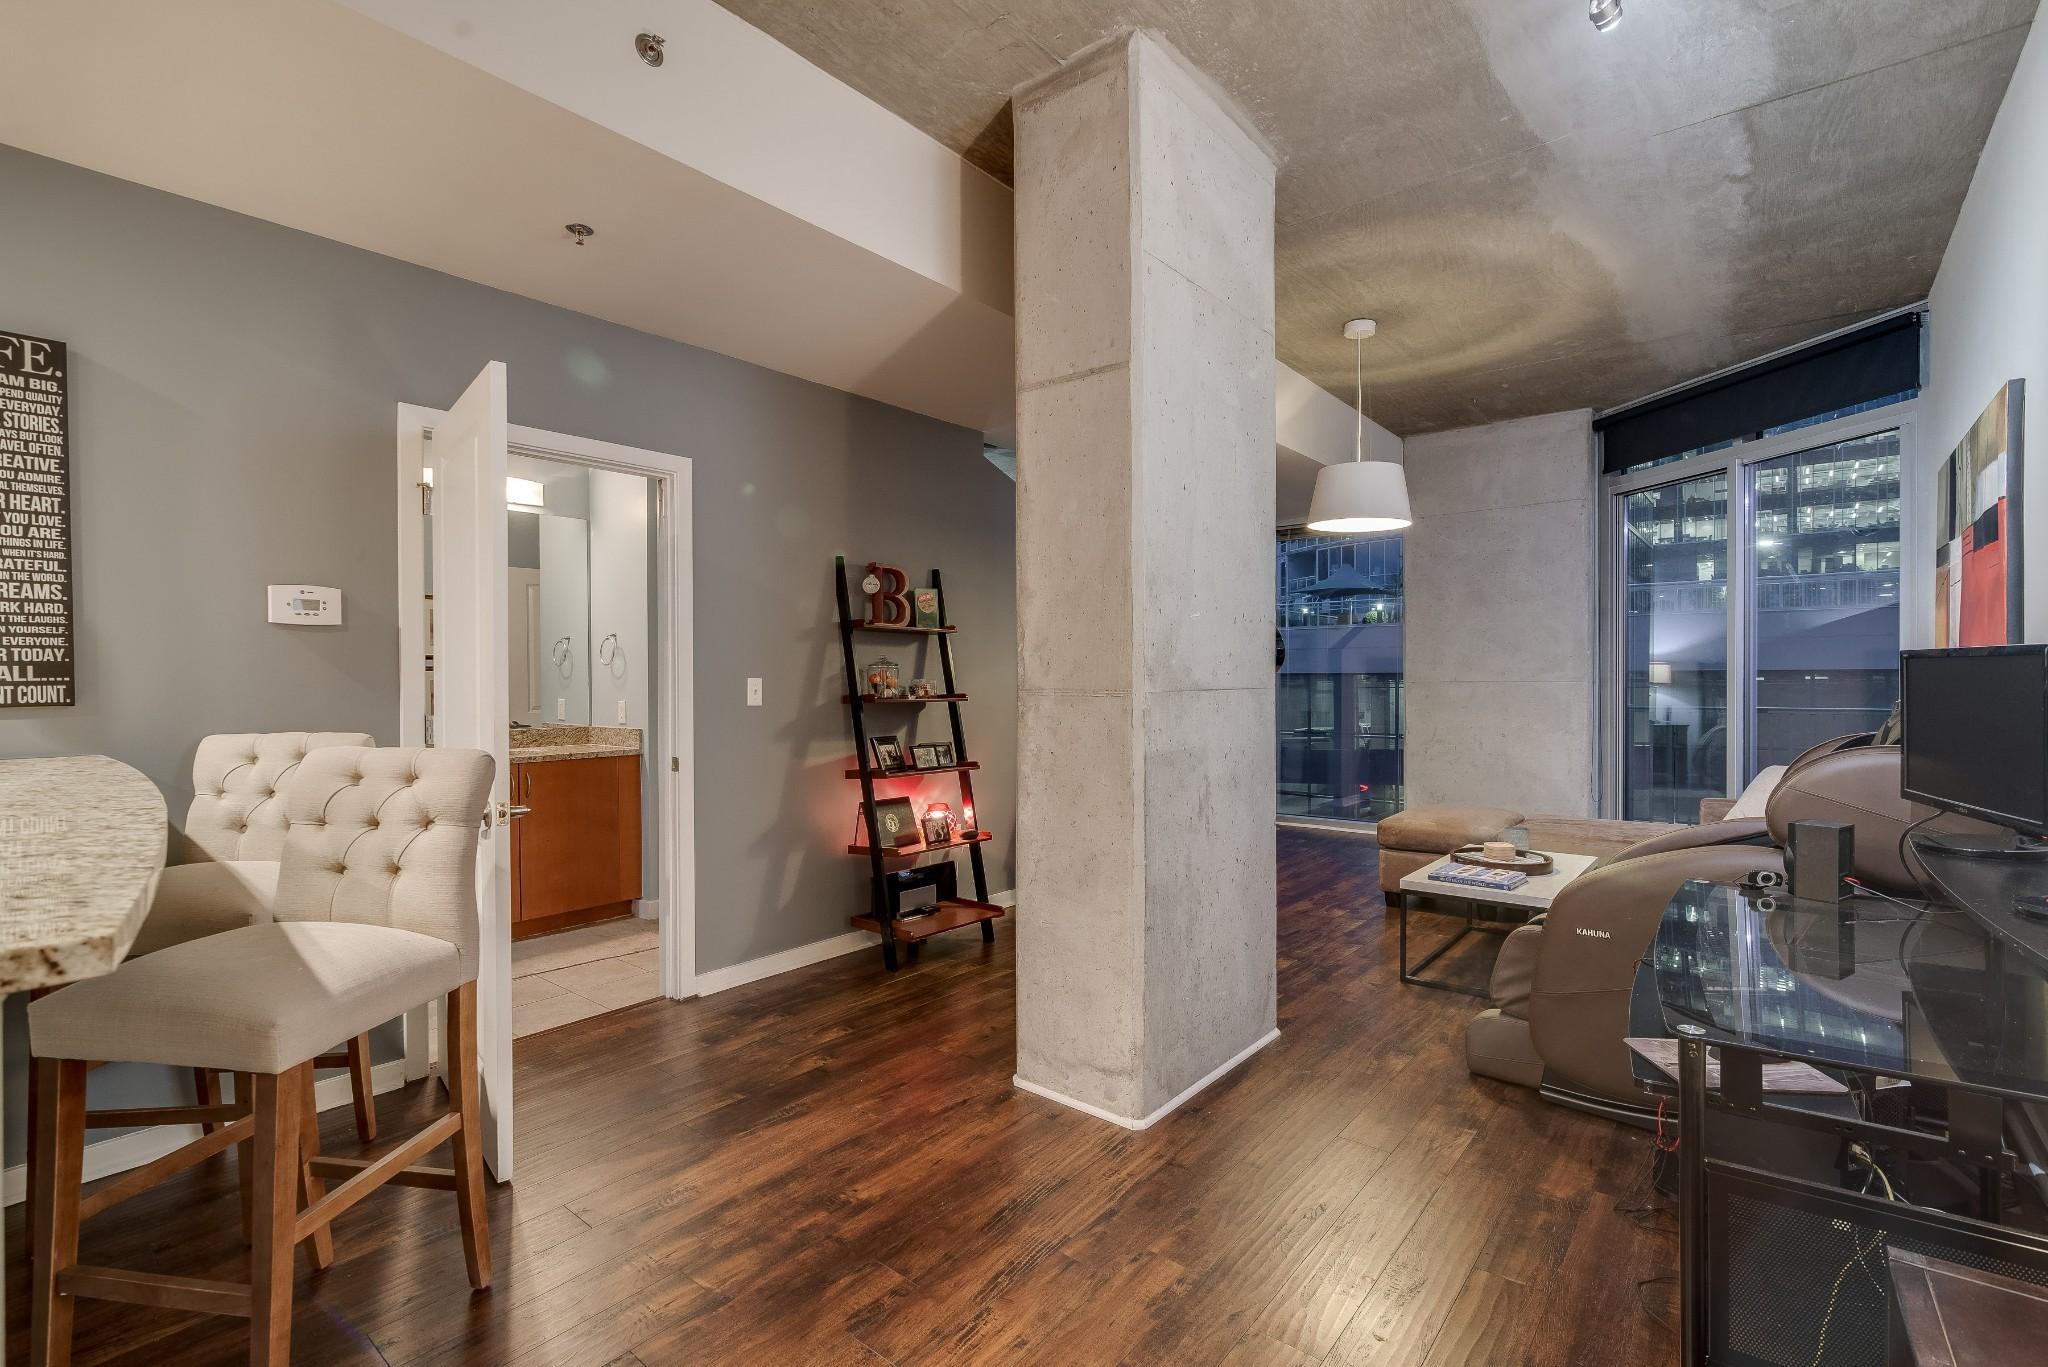 301 Demonbreun St, Unit 809 Property Photo - Nashville, TN real estate listing